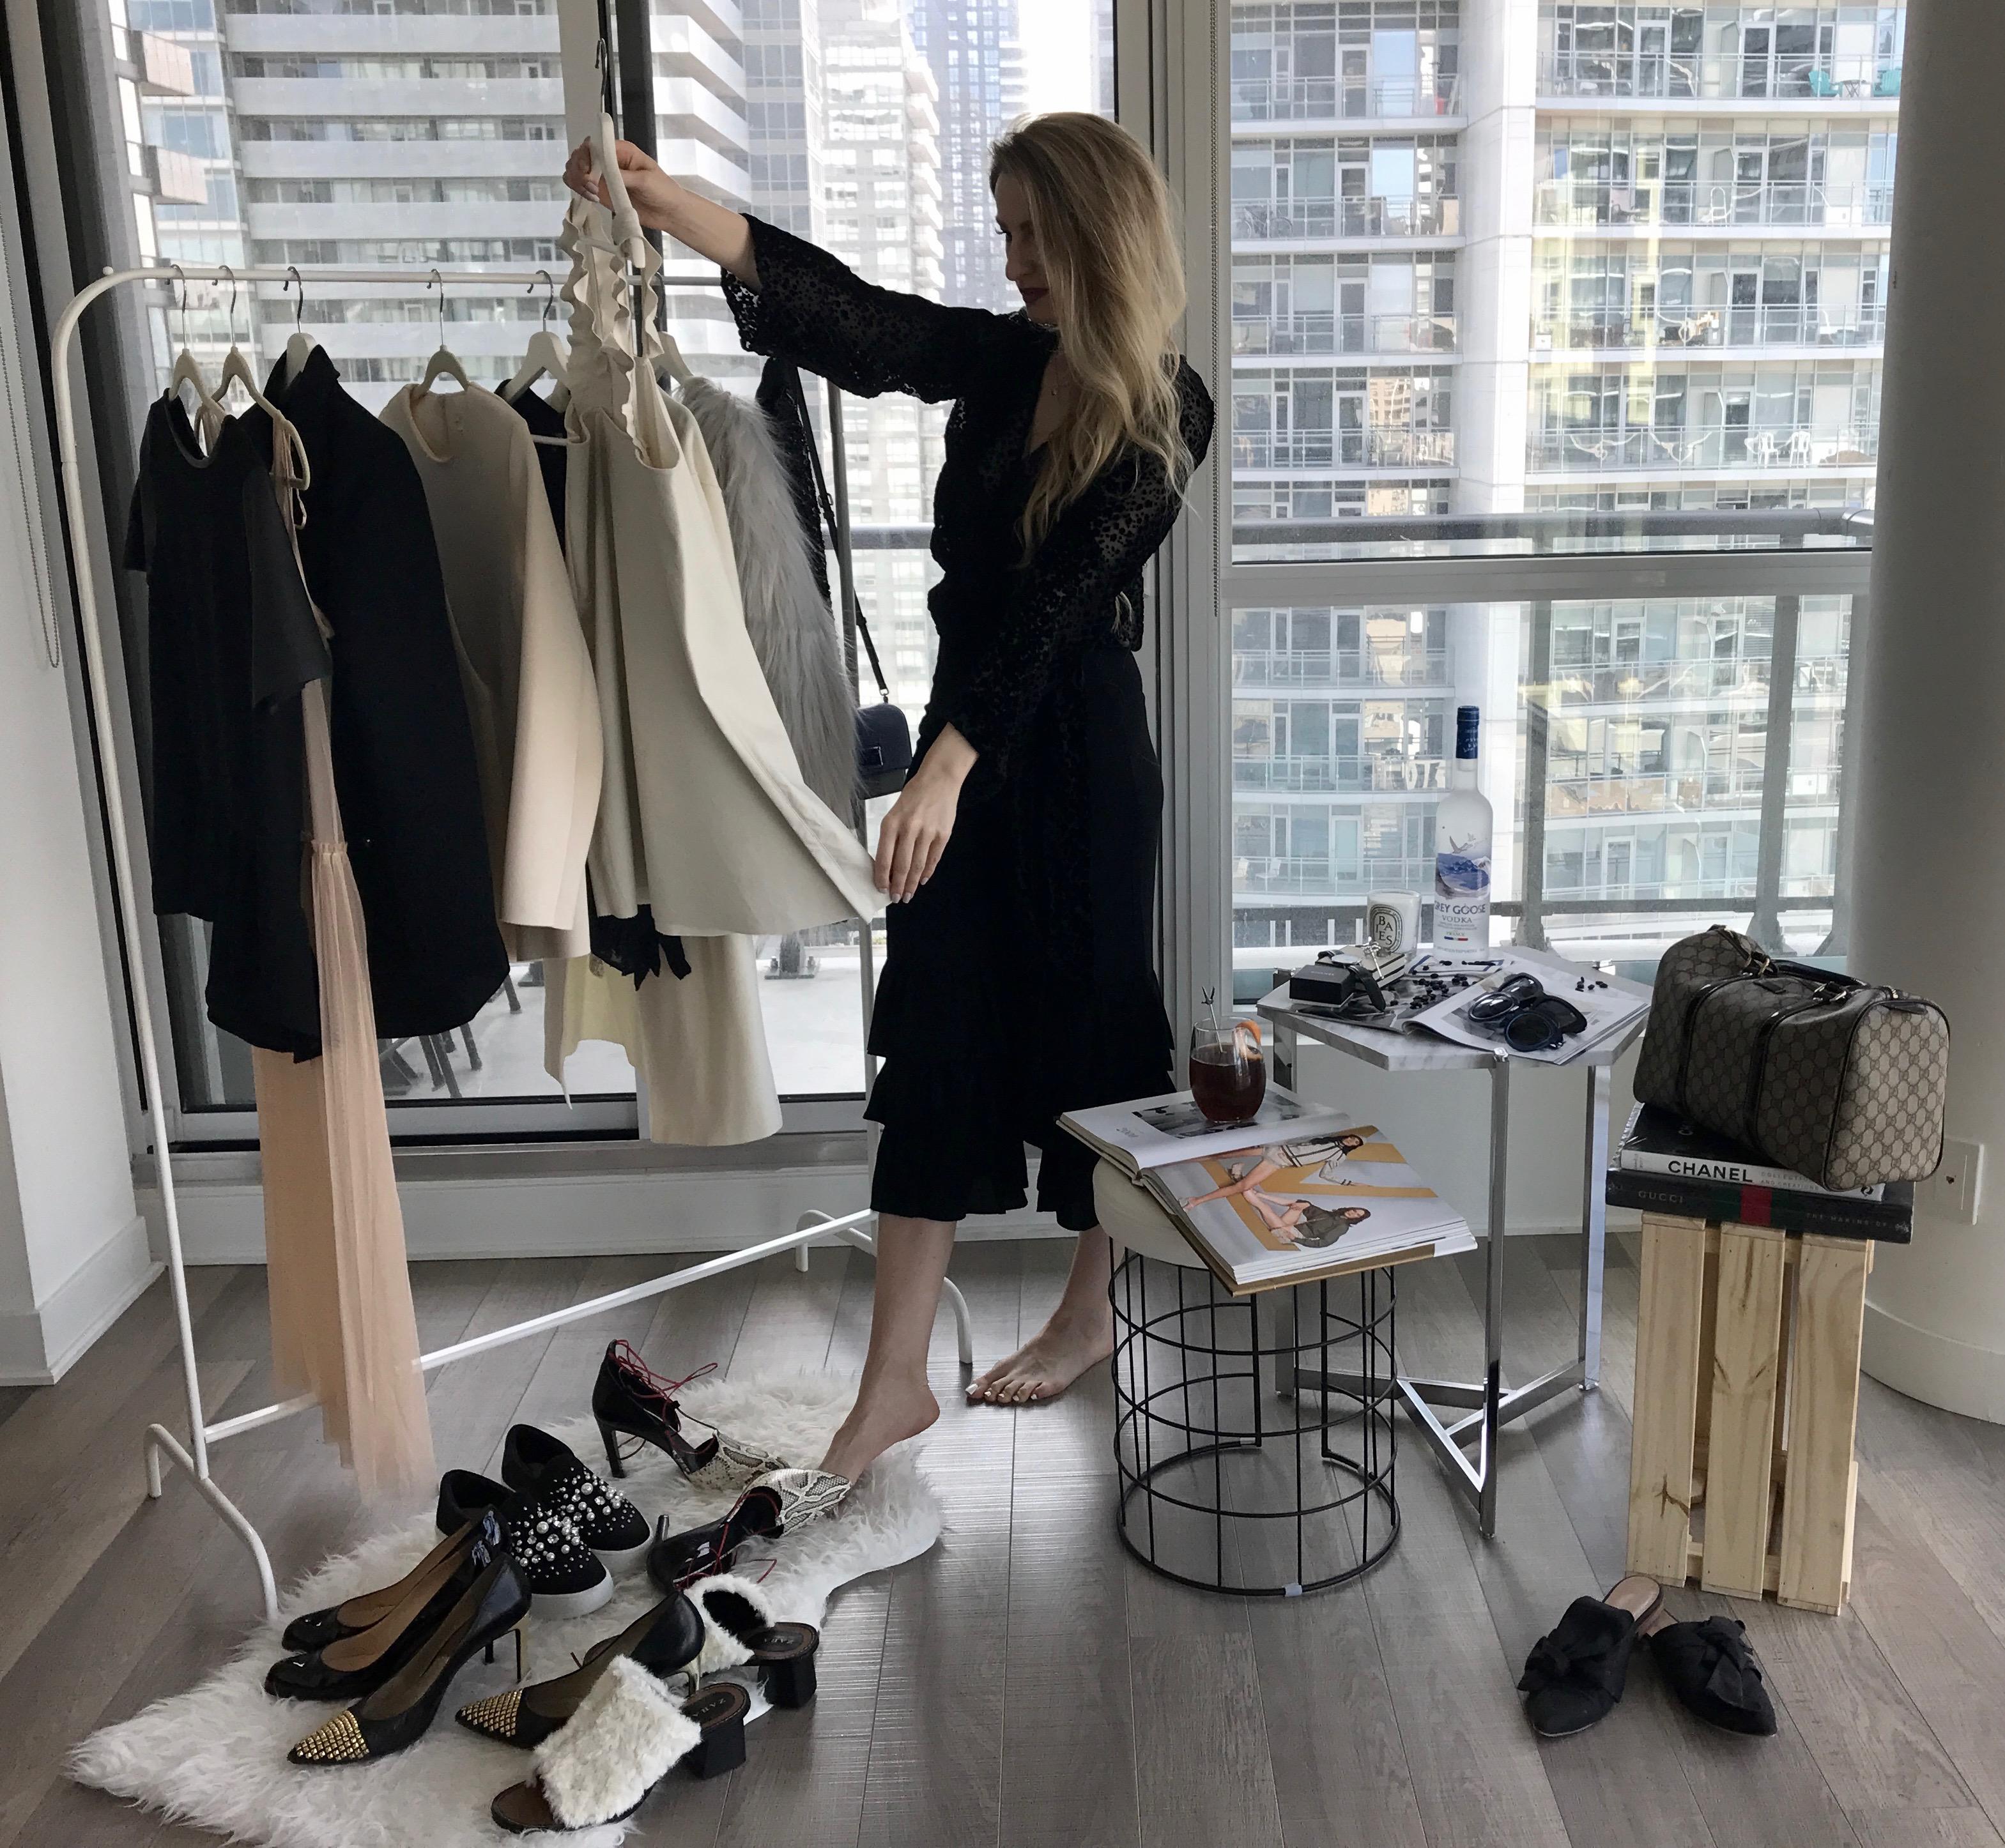 MON MODE Blog | Mon Mode | Style Blog | Toronto Blogger | Fashionbogger |Toronto Fashion Week